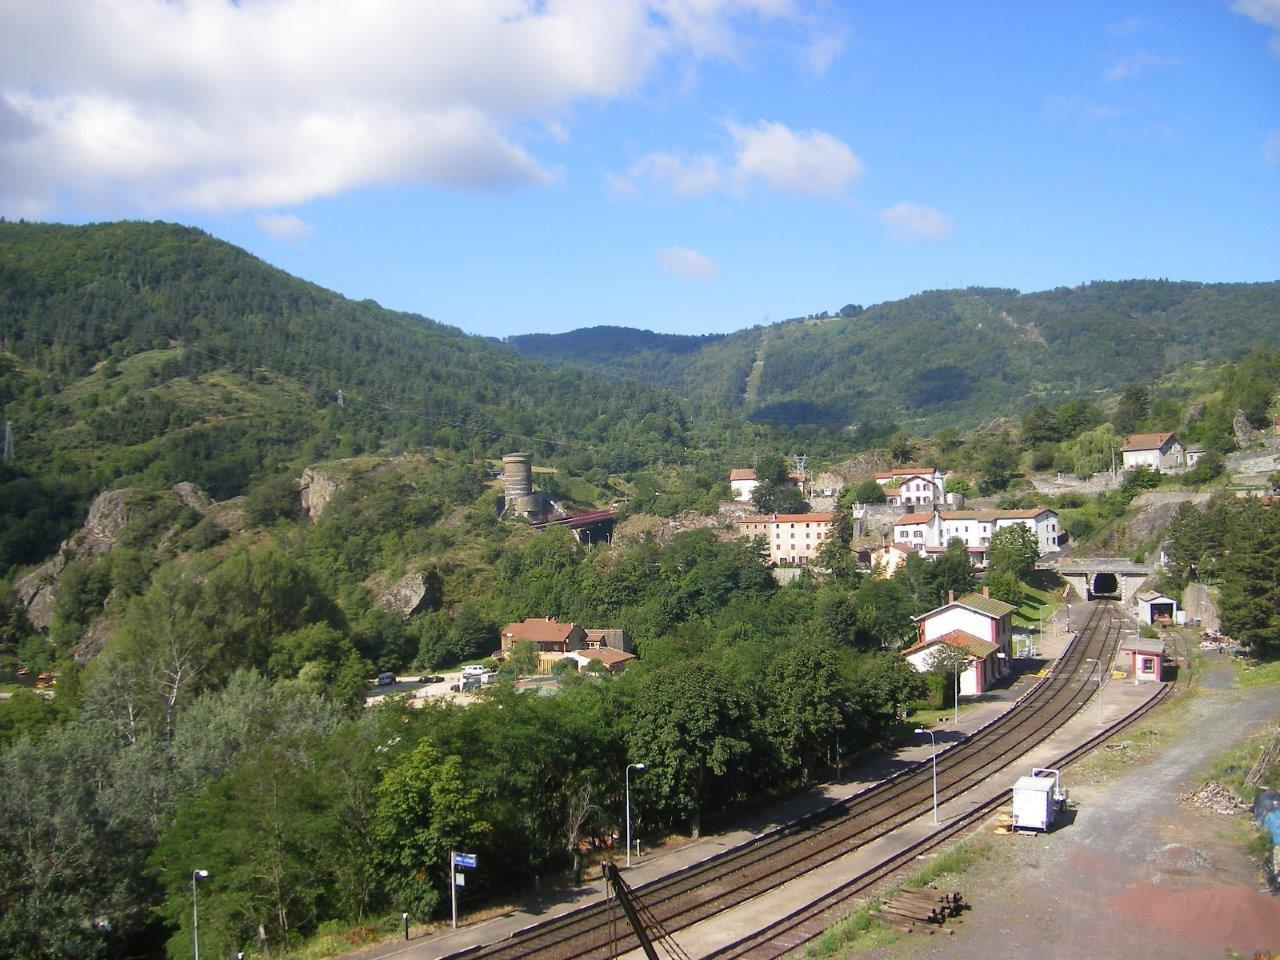 gare-de-monistrol-d-allier-train-station